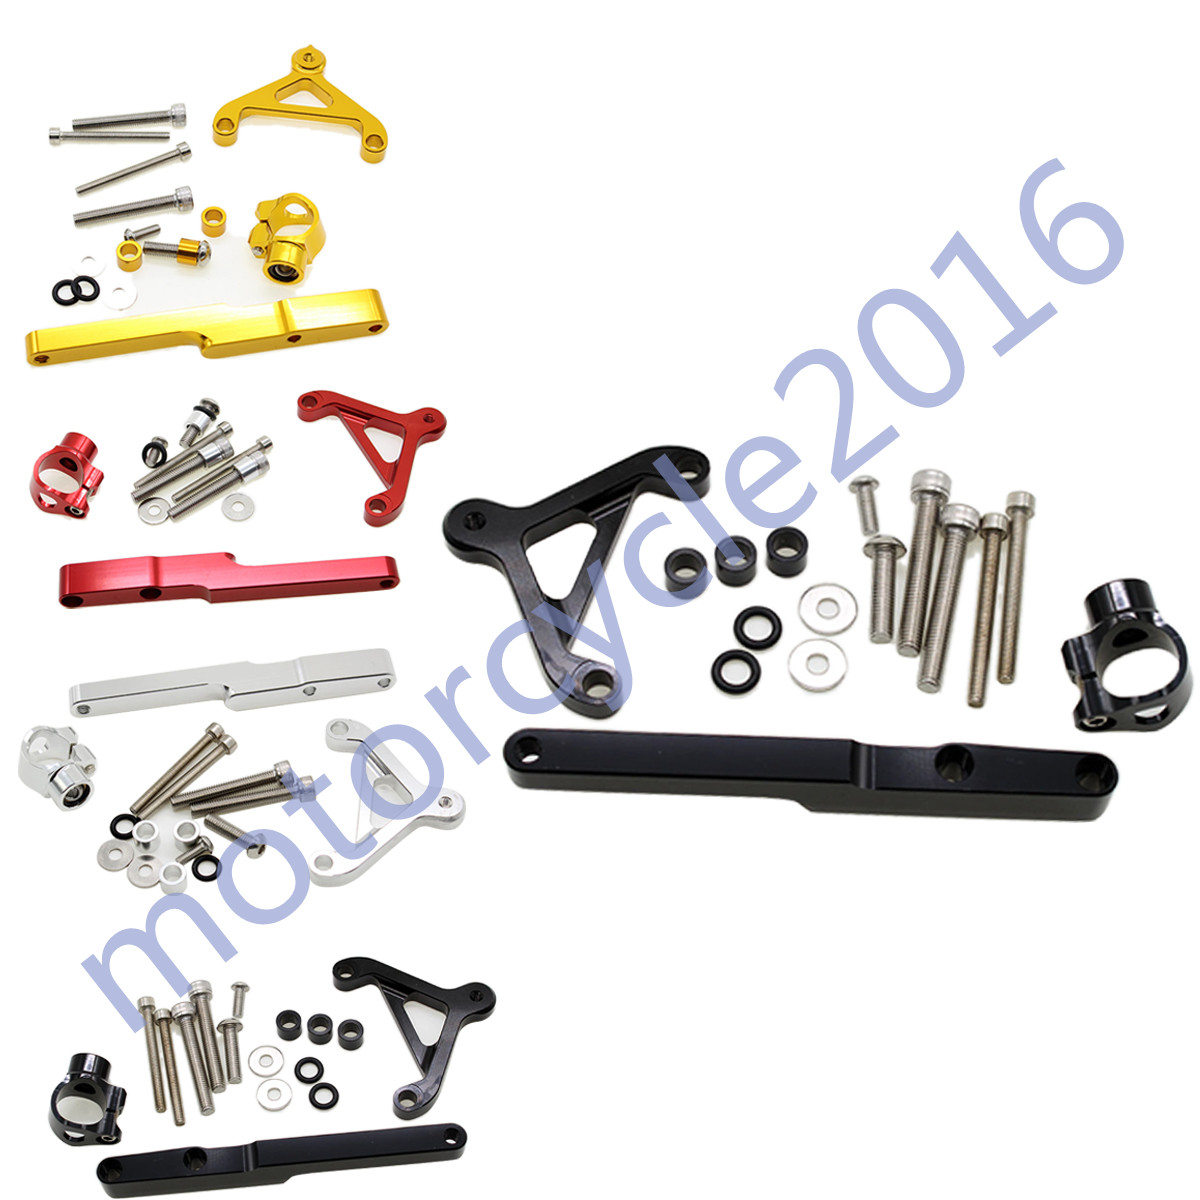 ФОТО Adjustable Steering Stabilize Damper bracket Mount kit For HONDA CB1000R 2008-2010 2011-2016 T6061-T6 Aluminum One set CNC FXCNC